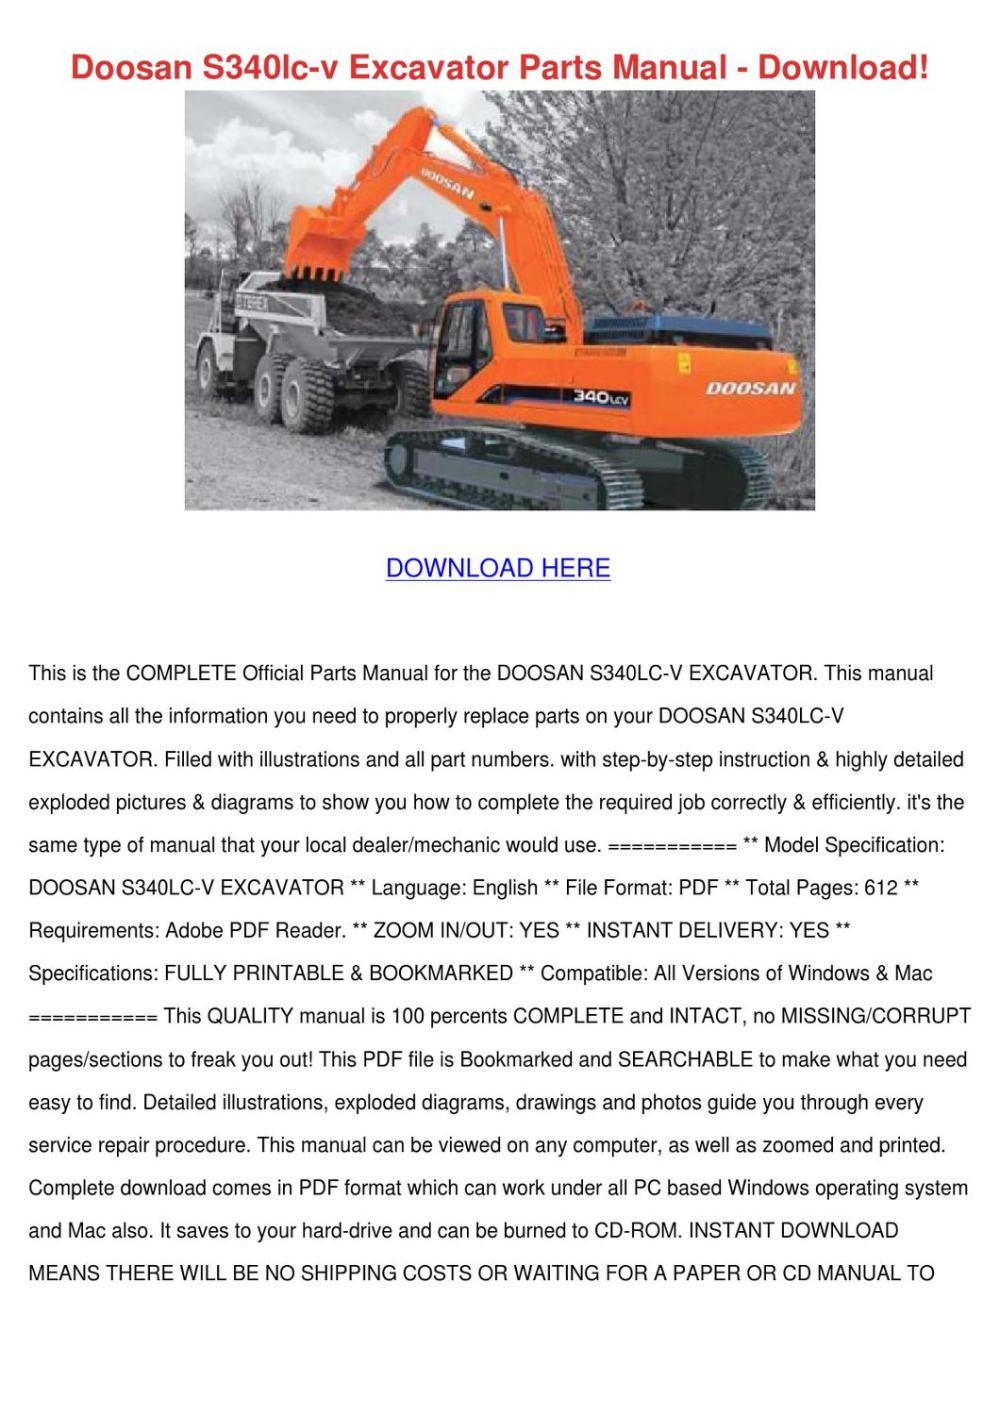 medium resolution of doosan s340lc v excavator parts manual downlo by philipppeltier issuu